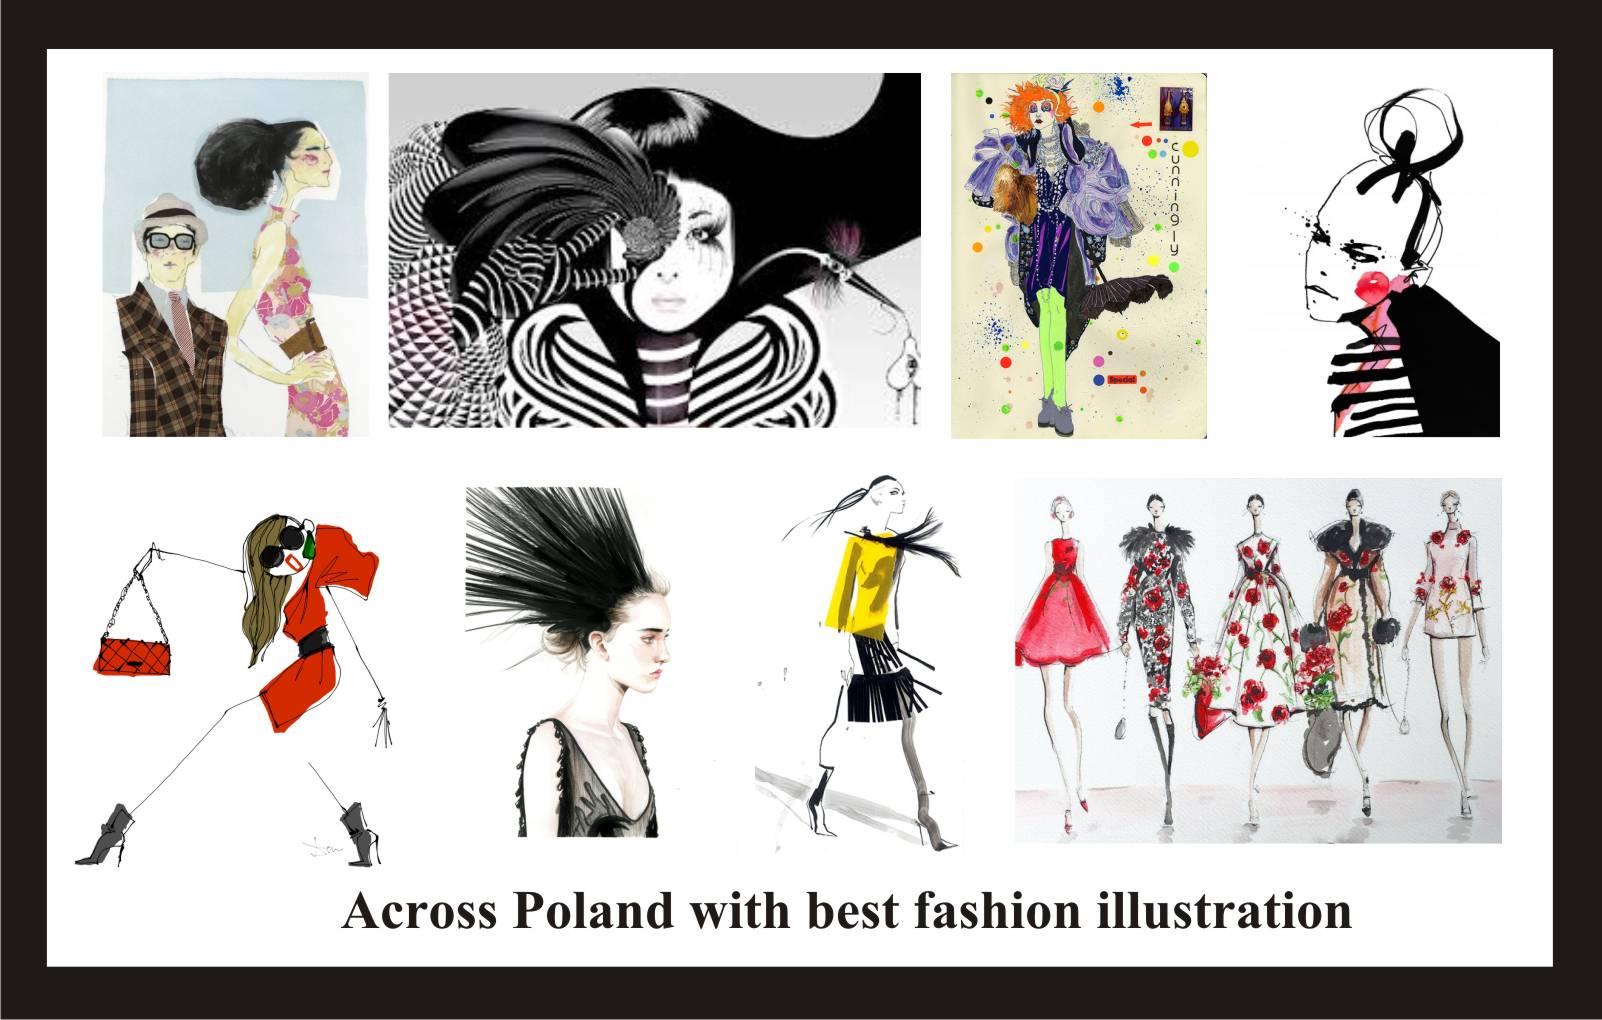 across-poland-fashion-illustration-1